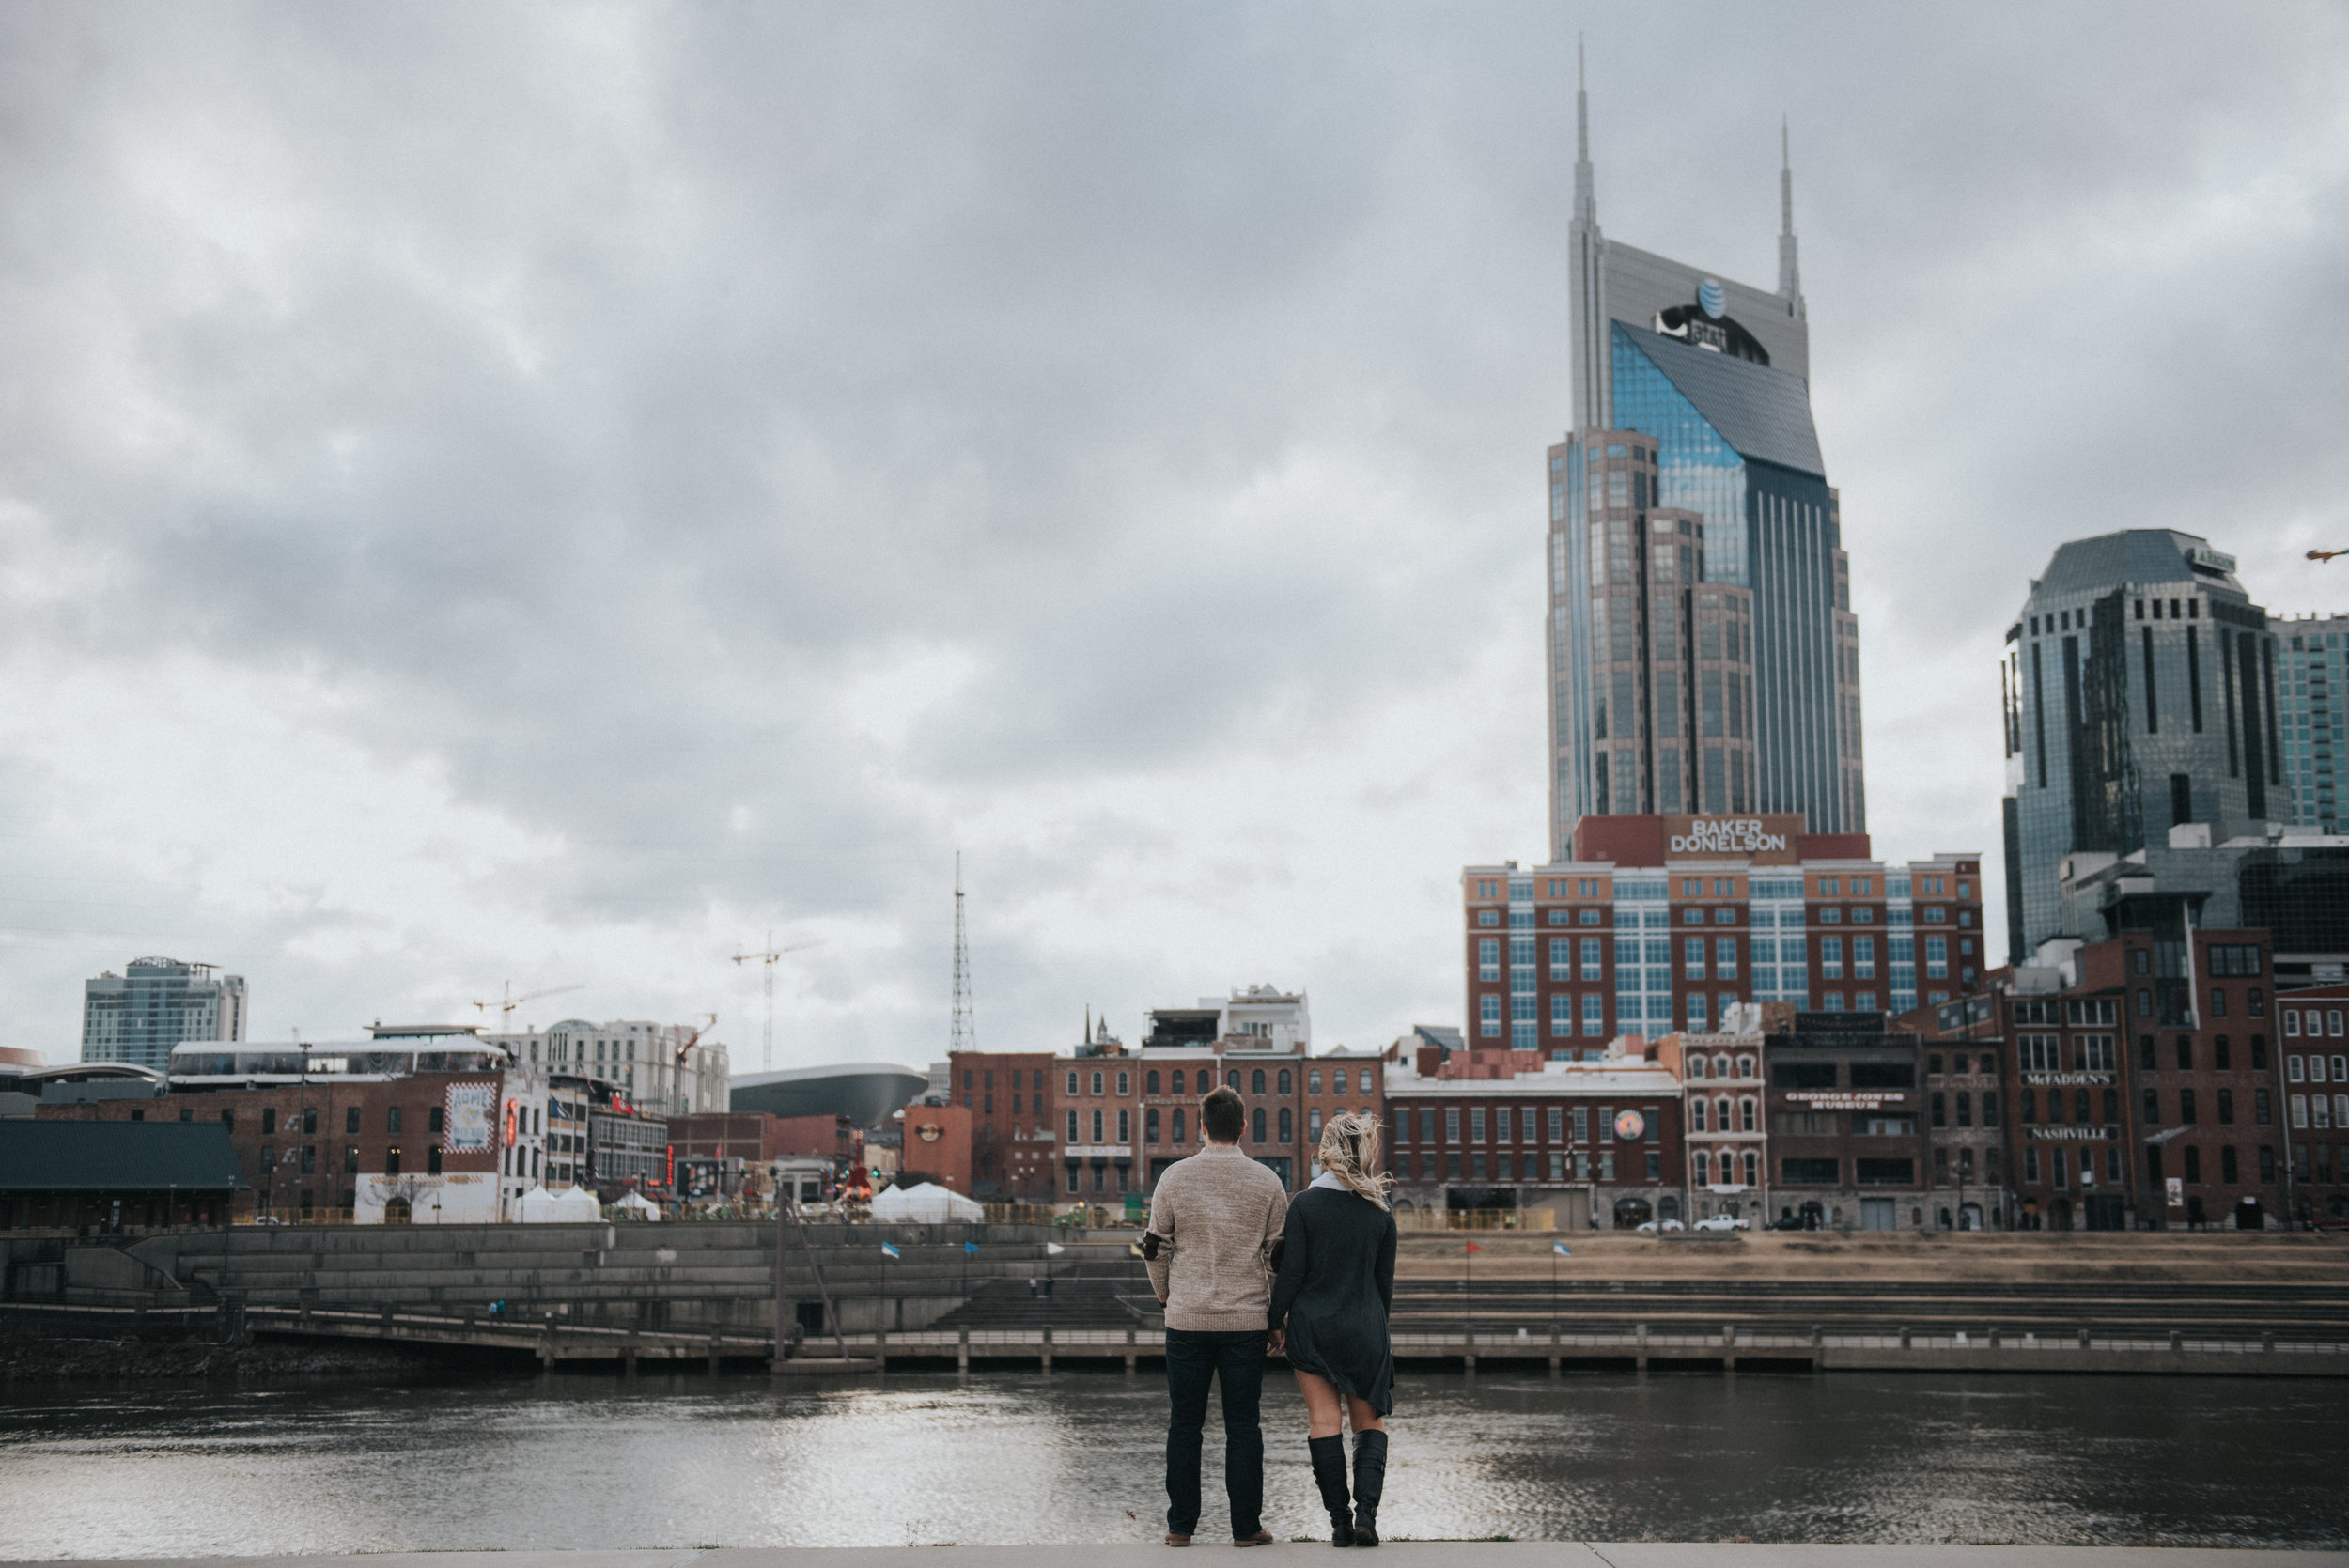 NashvilleWeddingCollection-29.jpg